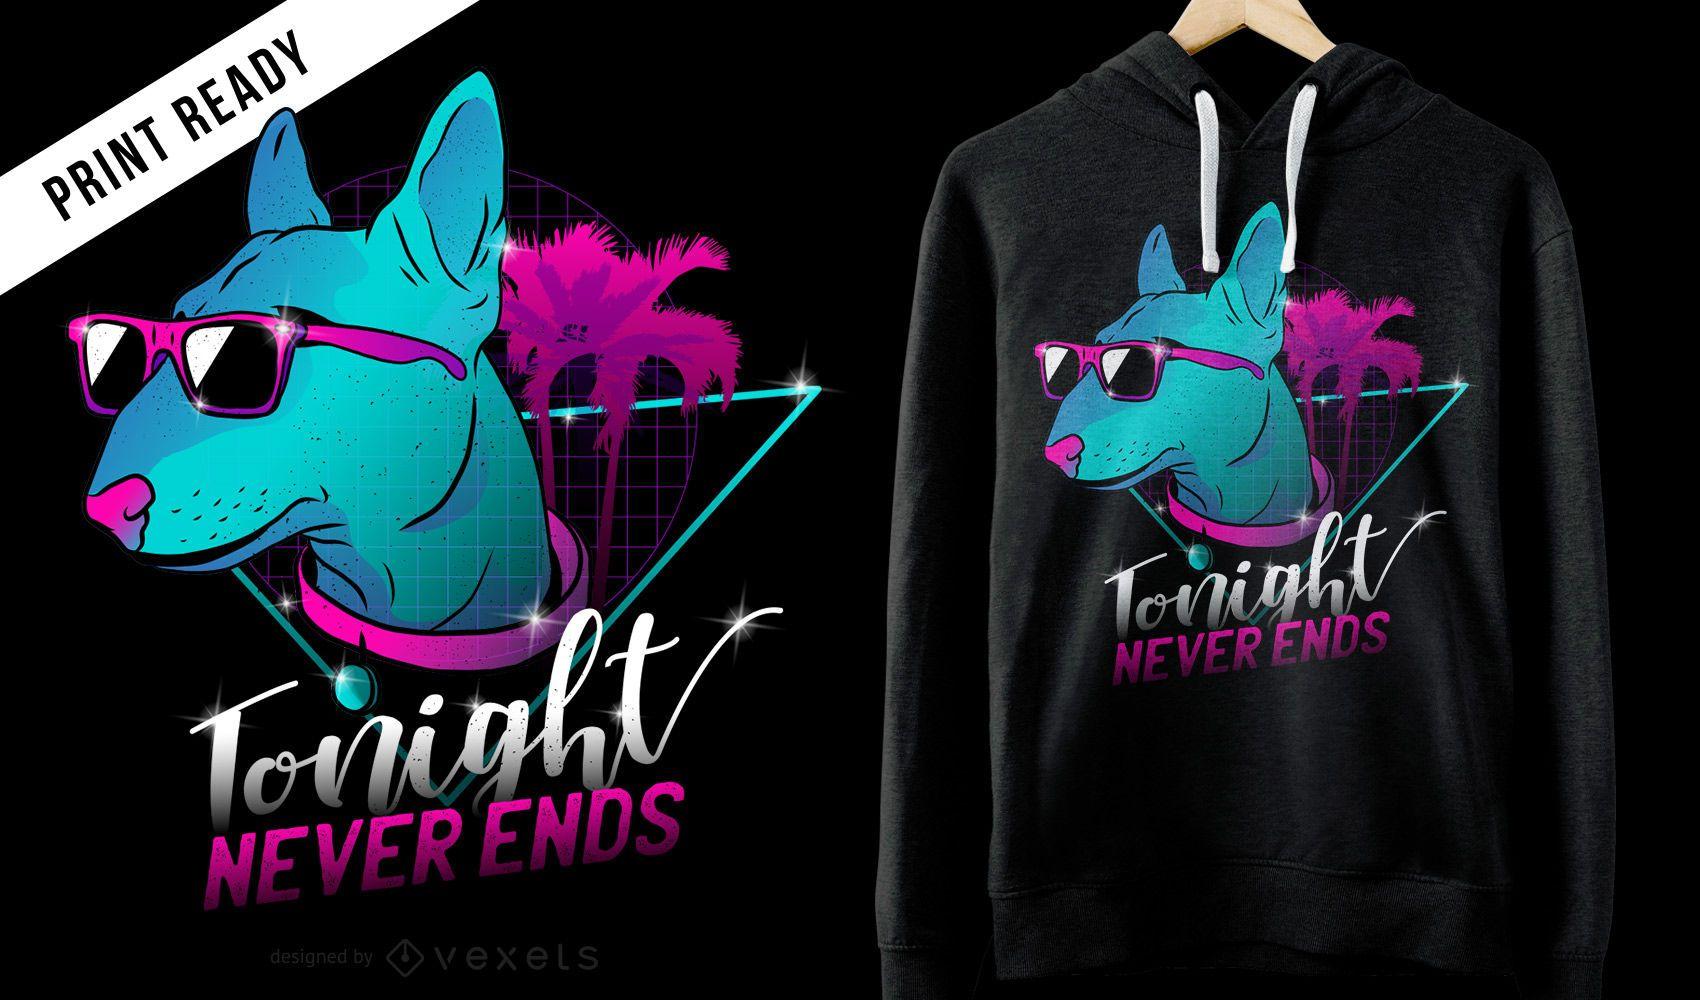 Neon dog t-shirt design